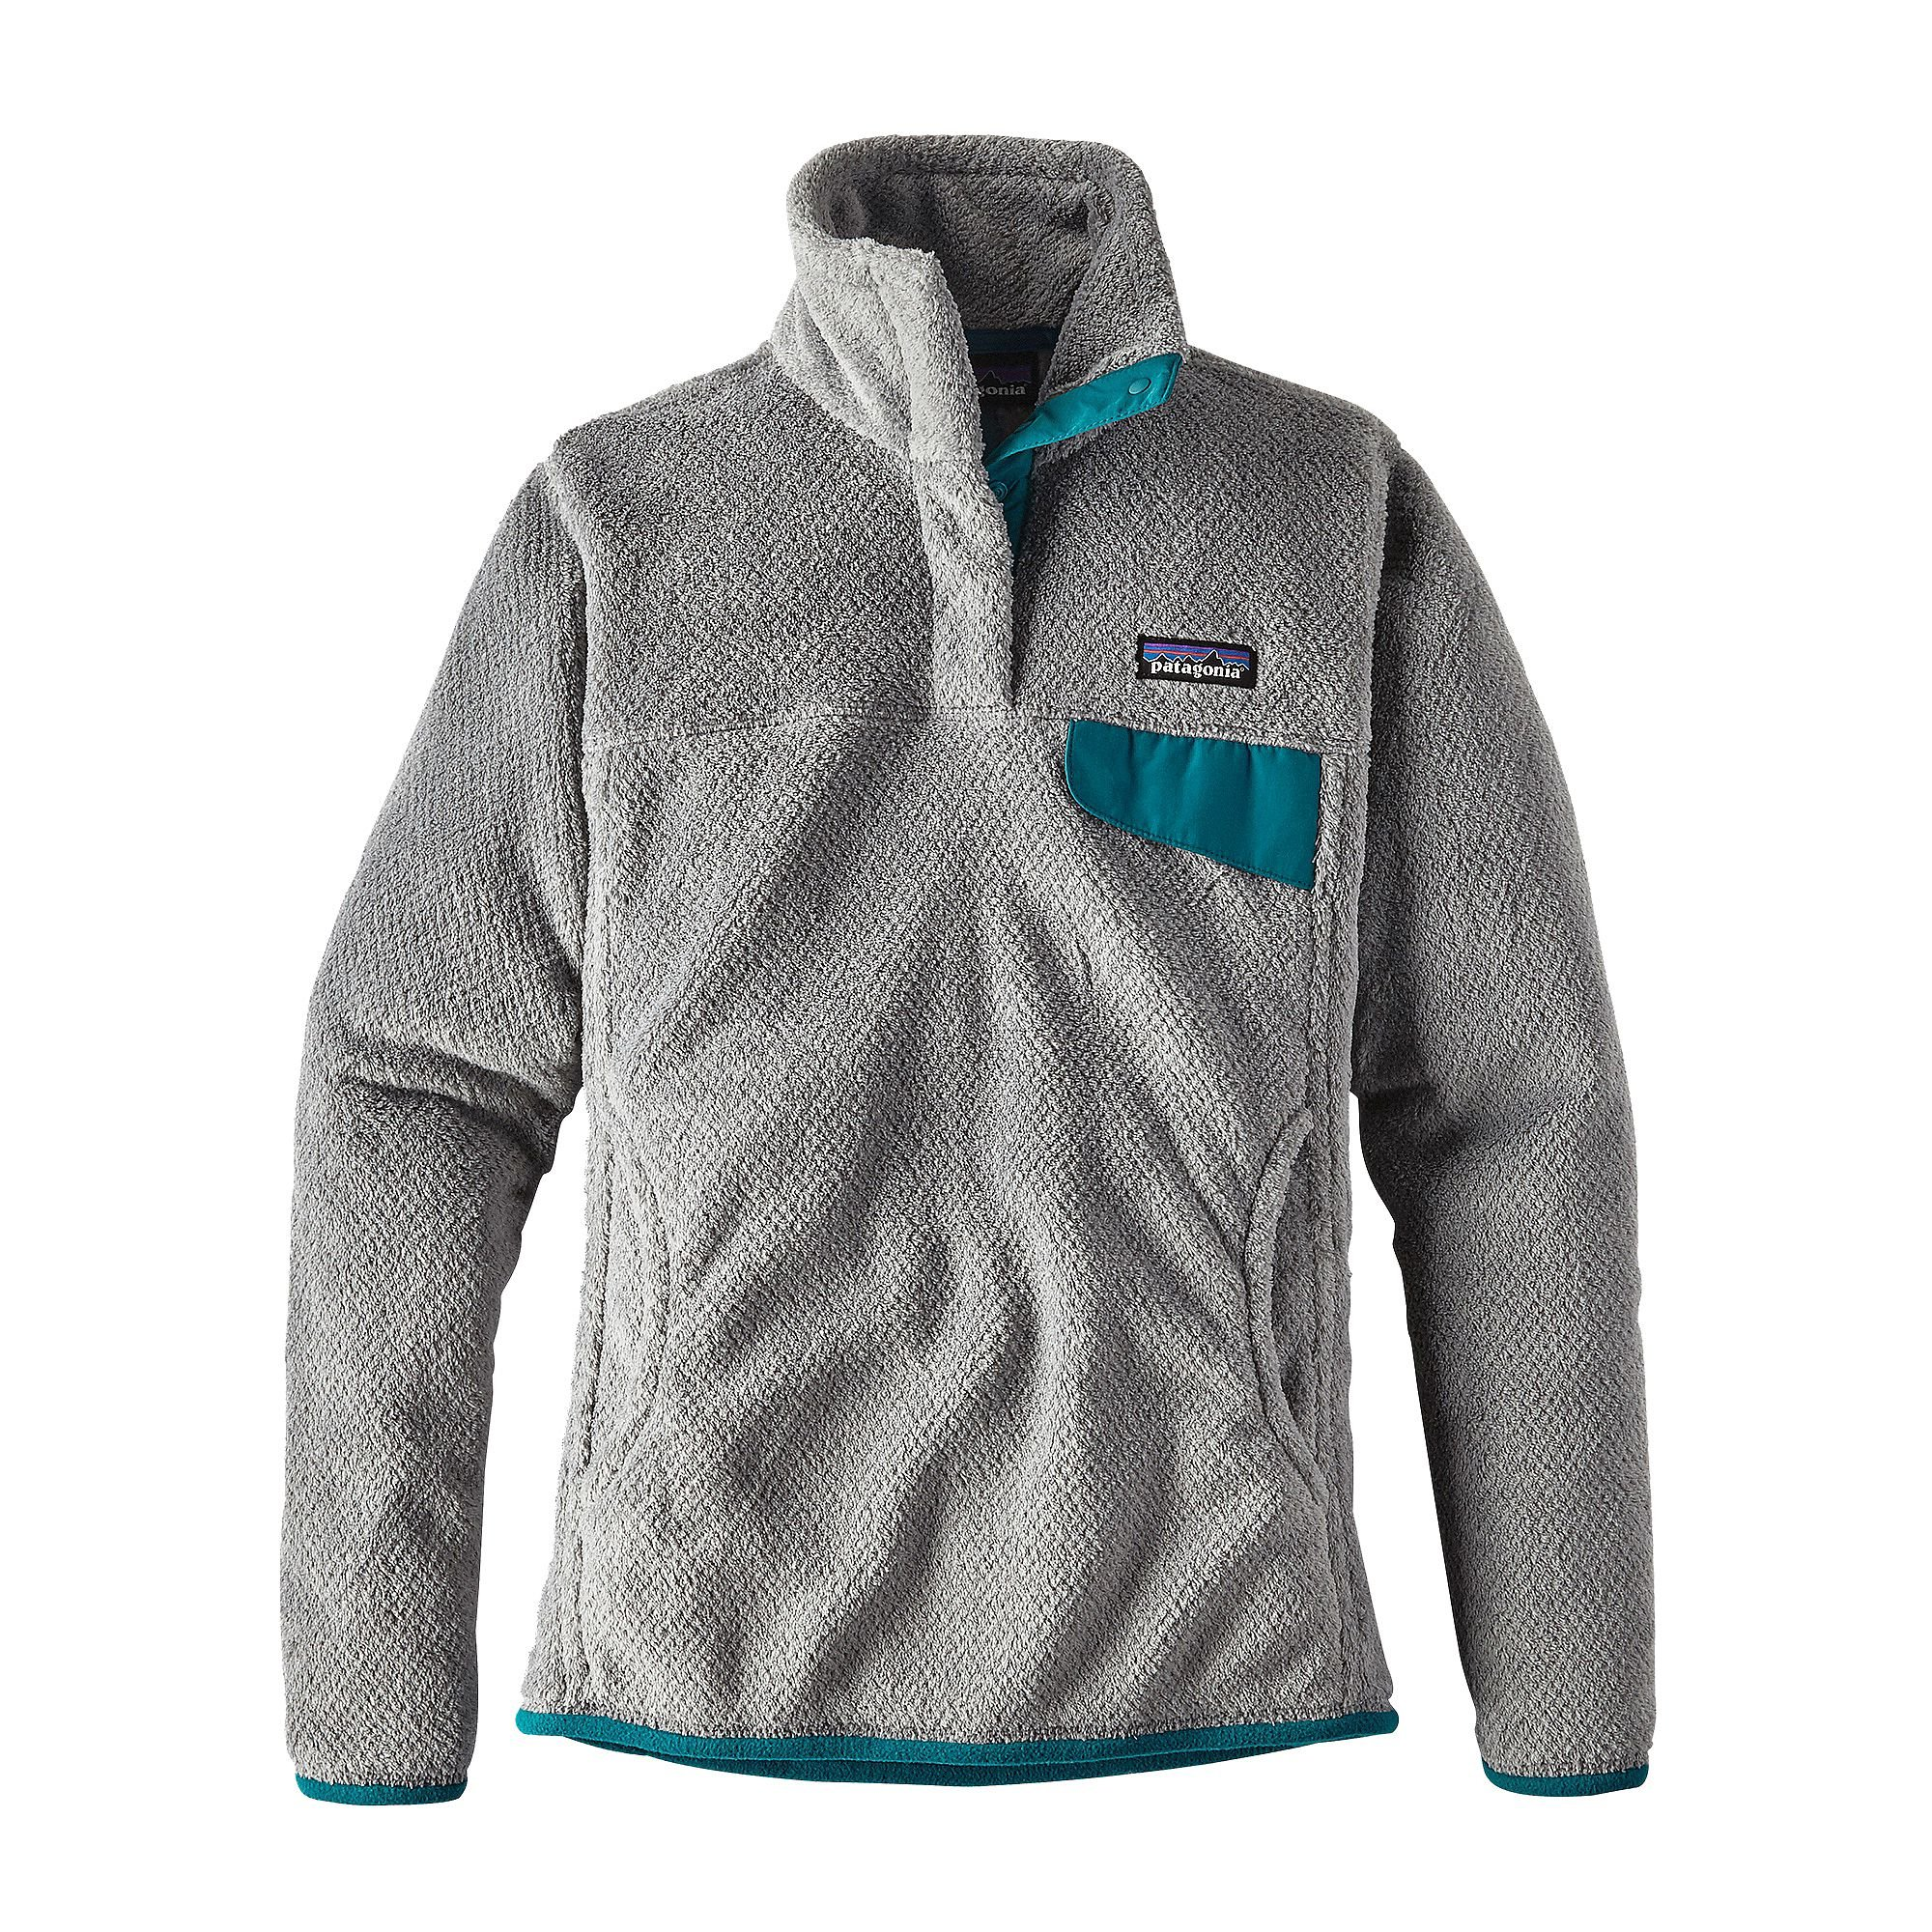 Patagonia Womens Re-Tool Snap-T Fleece Pullover (Medium, Tailored grey- Nickel X-Dye w/ Elwha Blue)